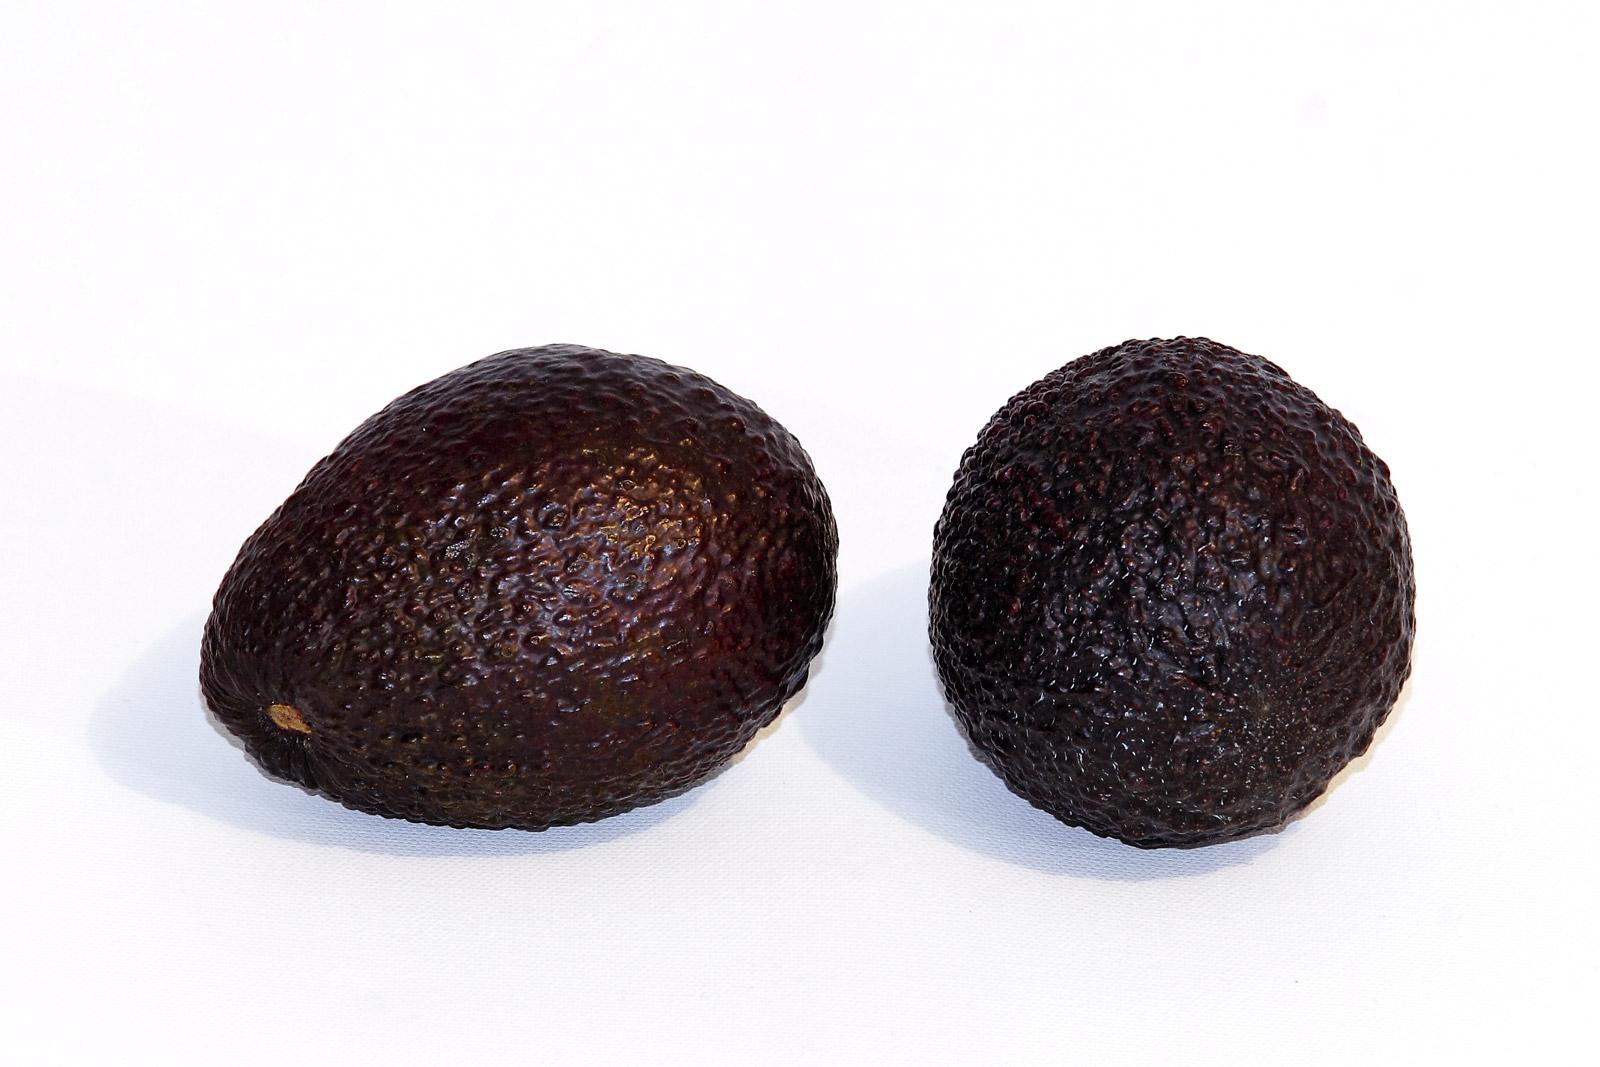 Hass avocado - Wikipedia